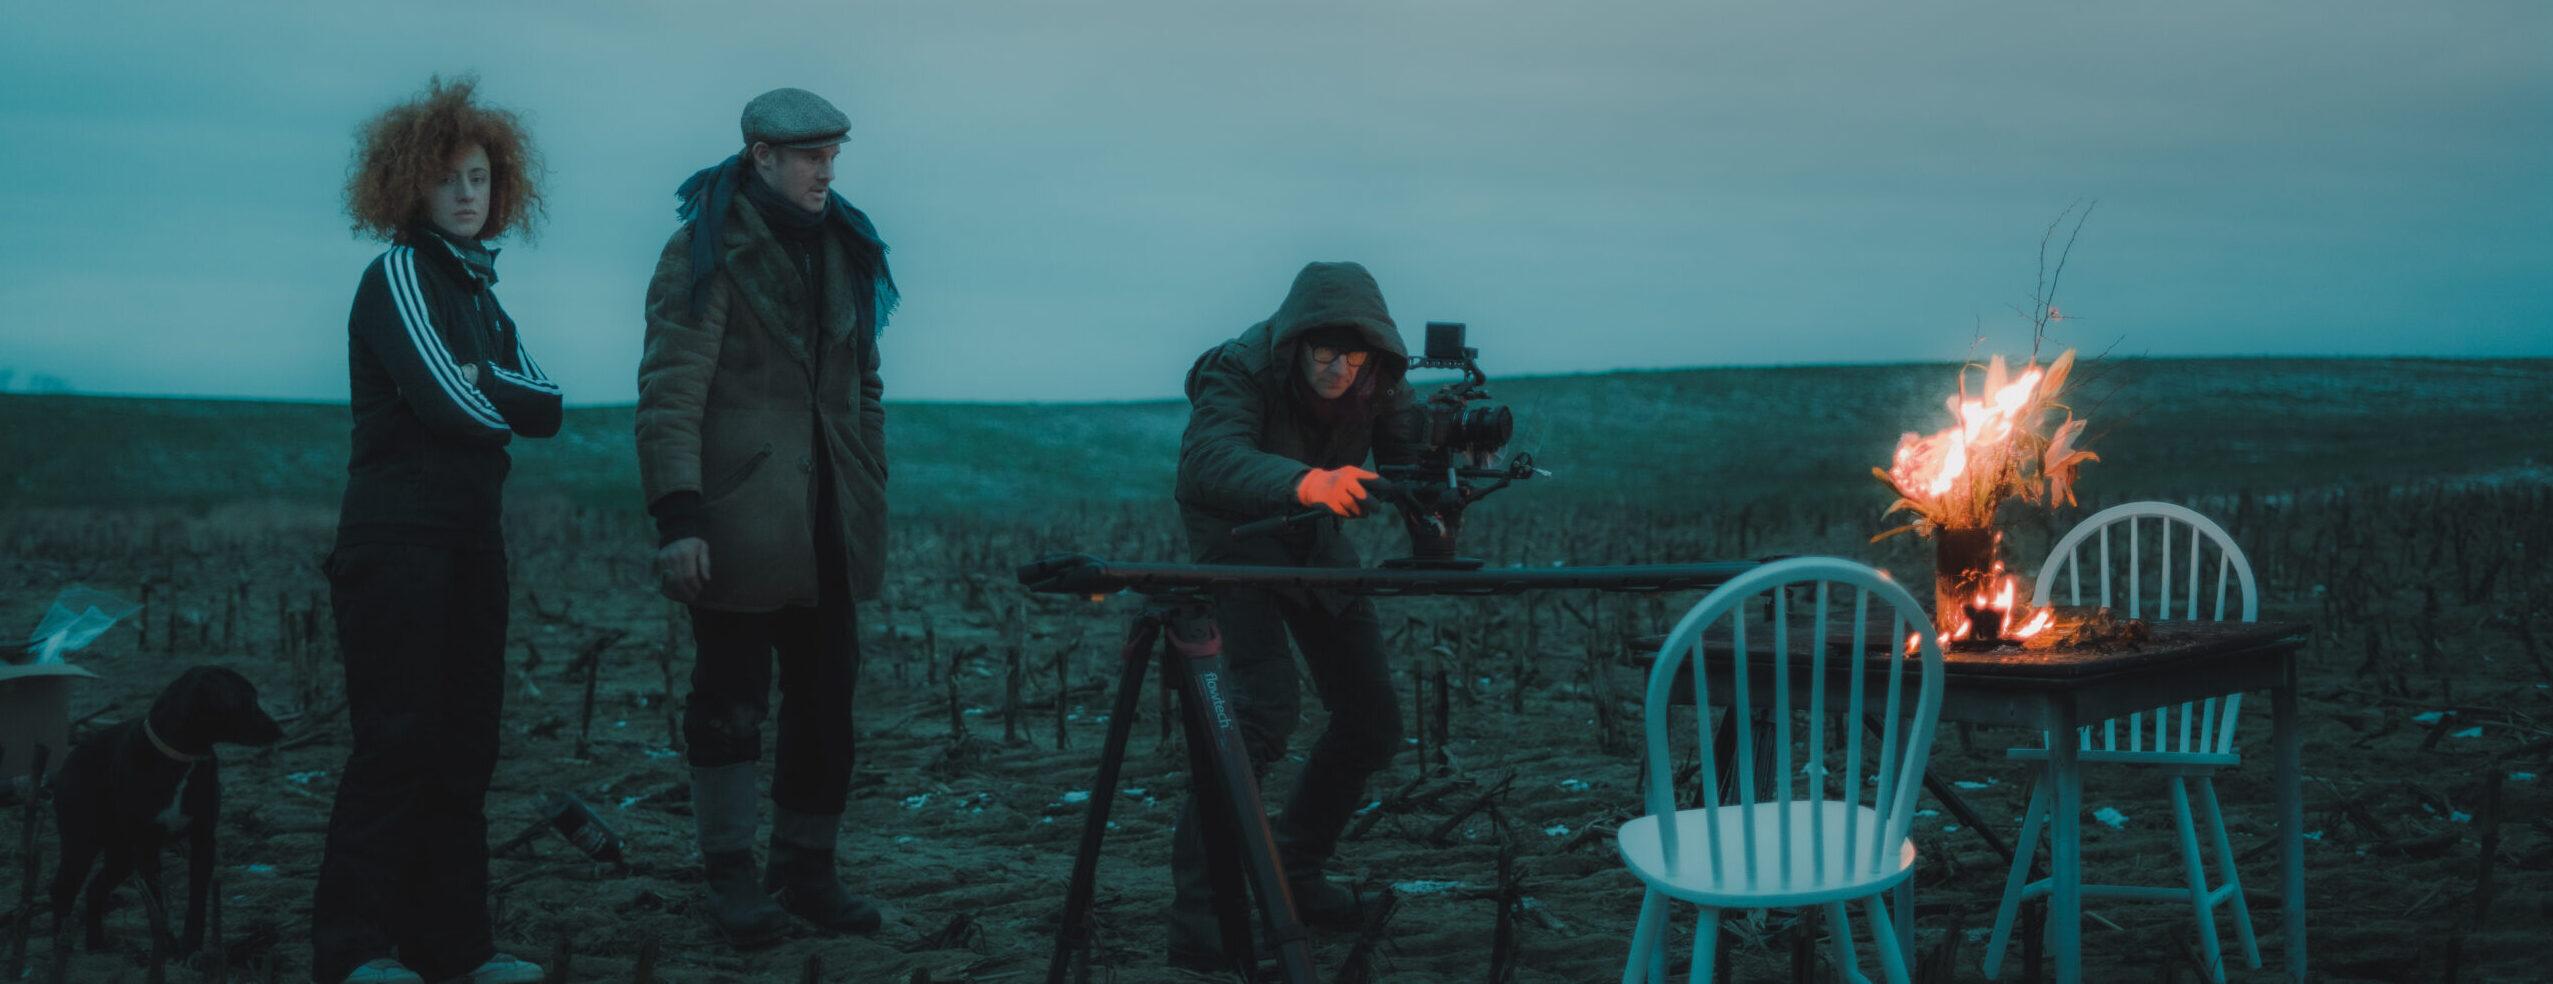 Setfoto Musikvideodreh auf freiem Feld